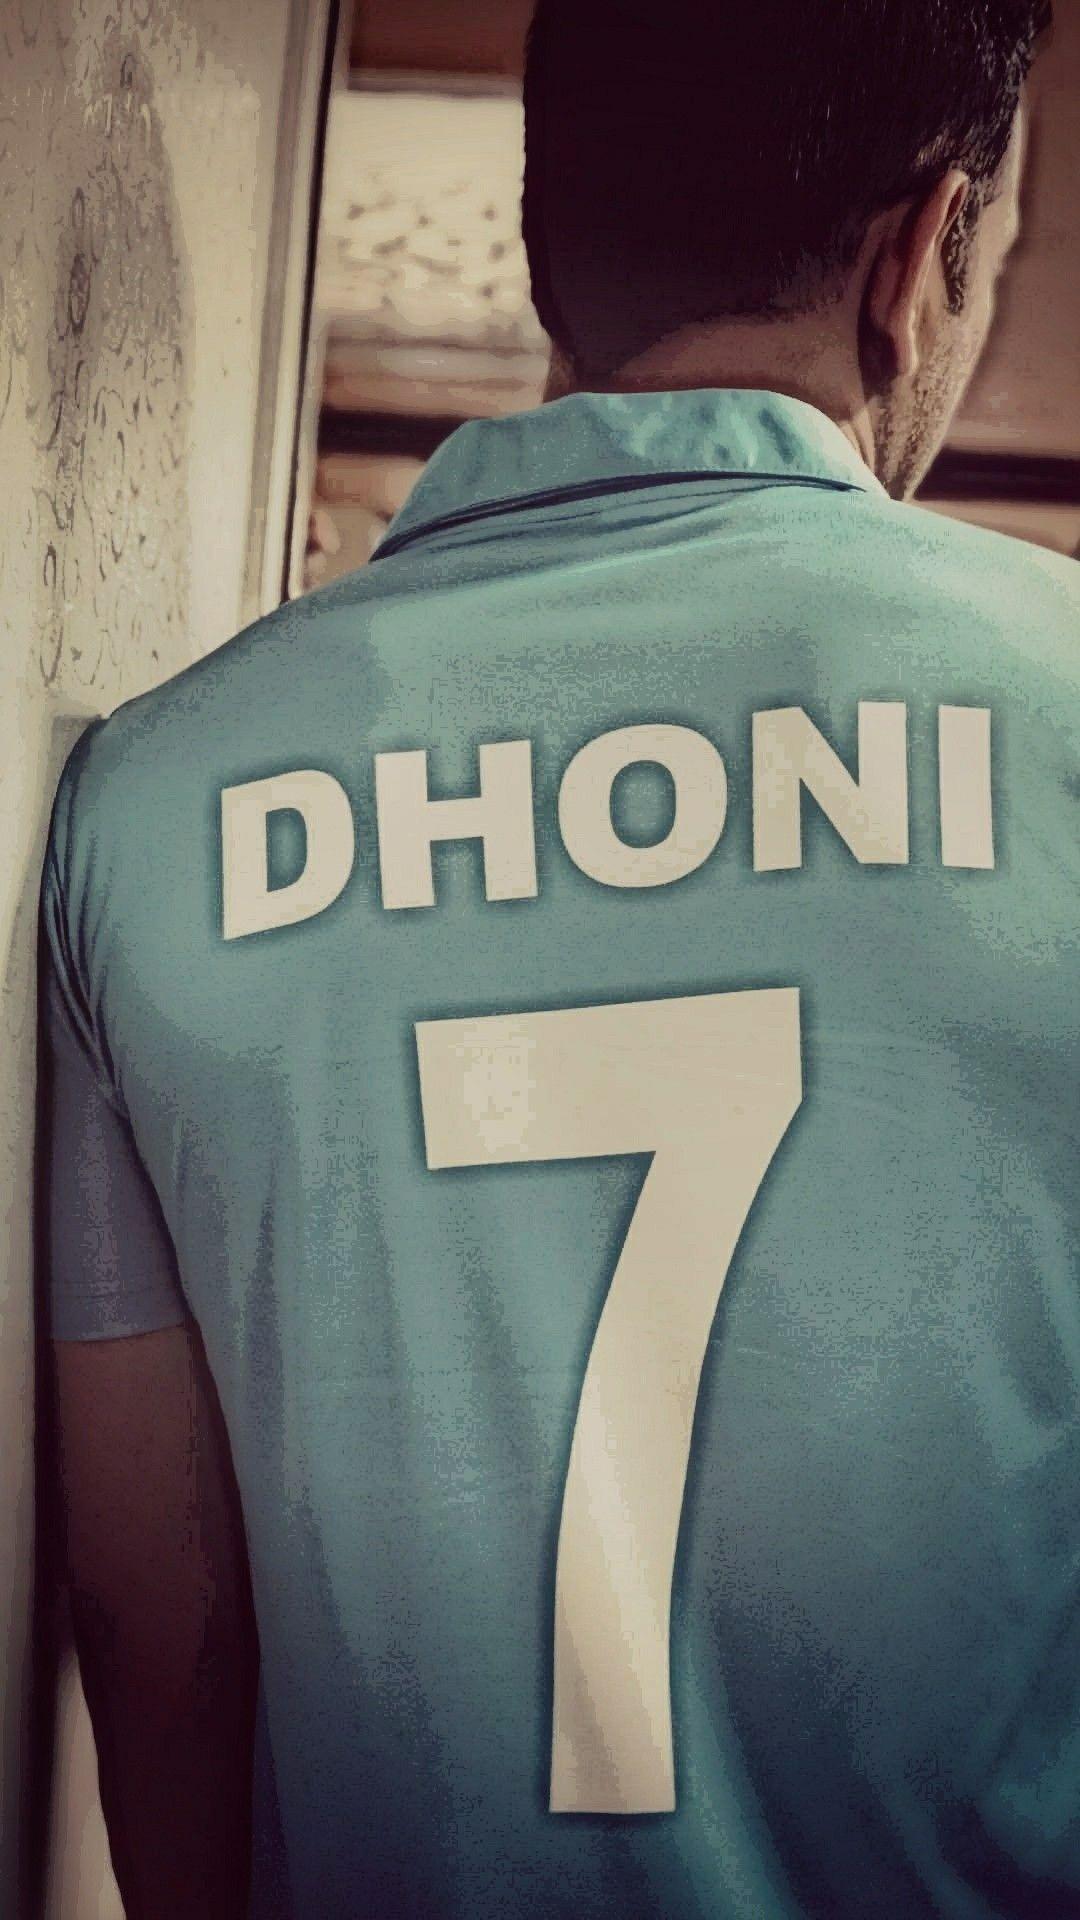 Mahendra Singh Dhoni Jersey no 7 Dhoni wallpapers Ms dhoni 1080x1920